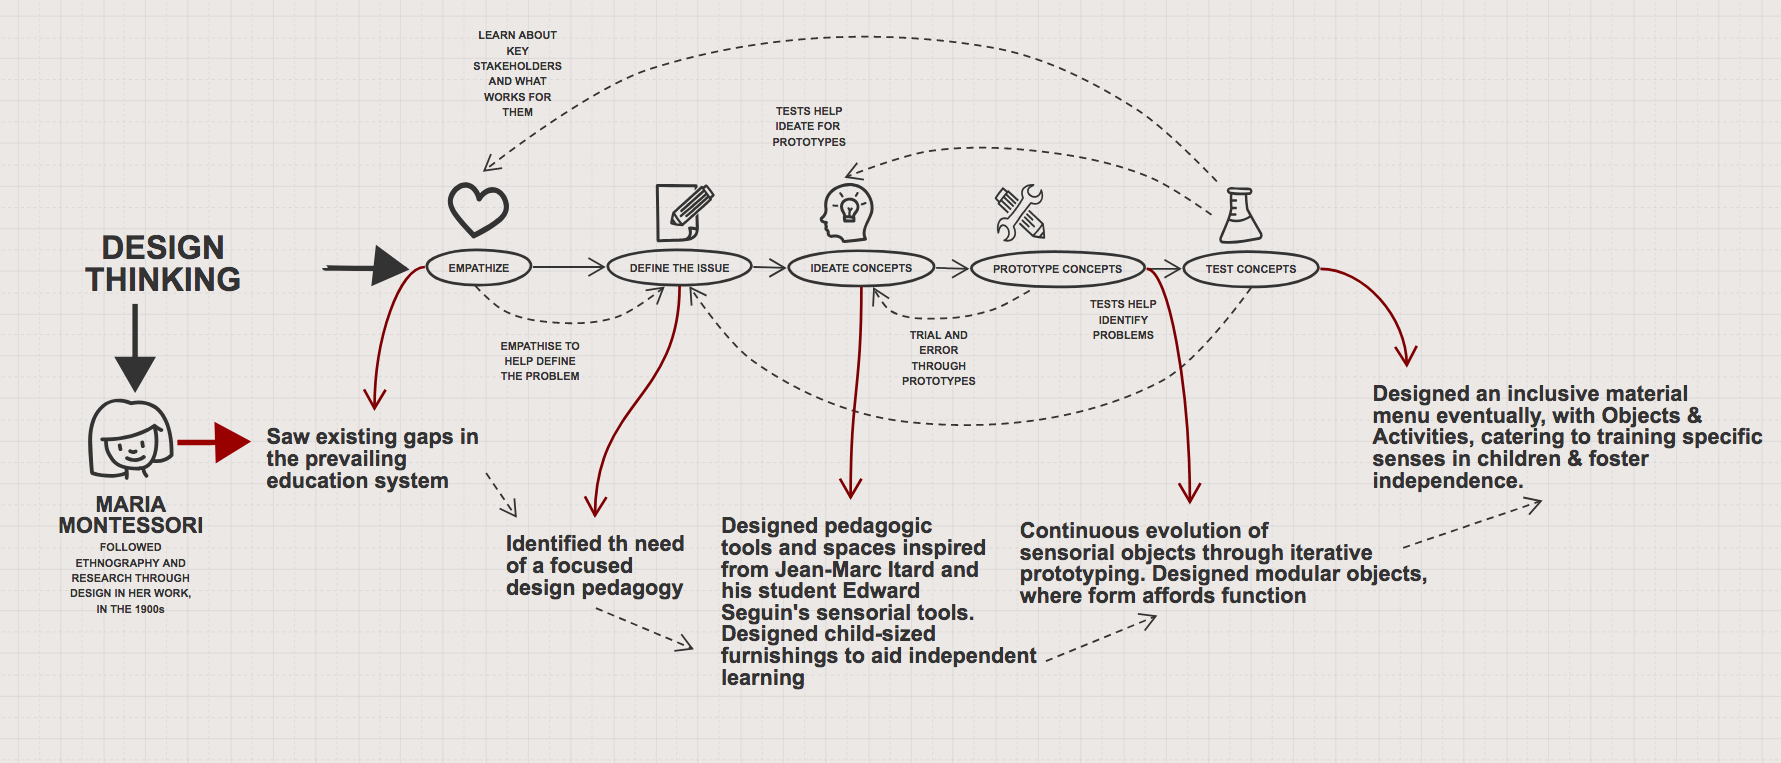 Design Thinking and Montessori